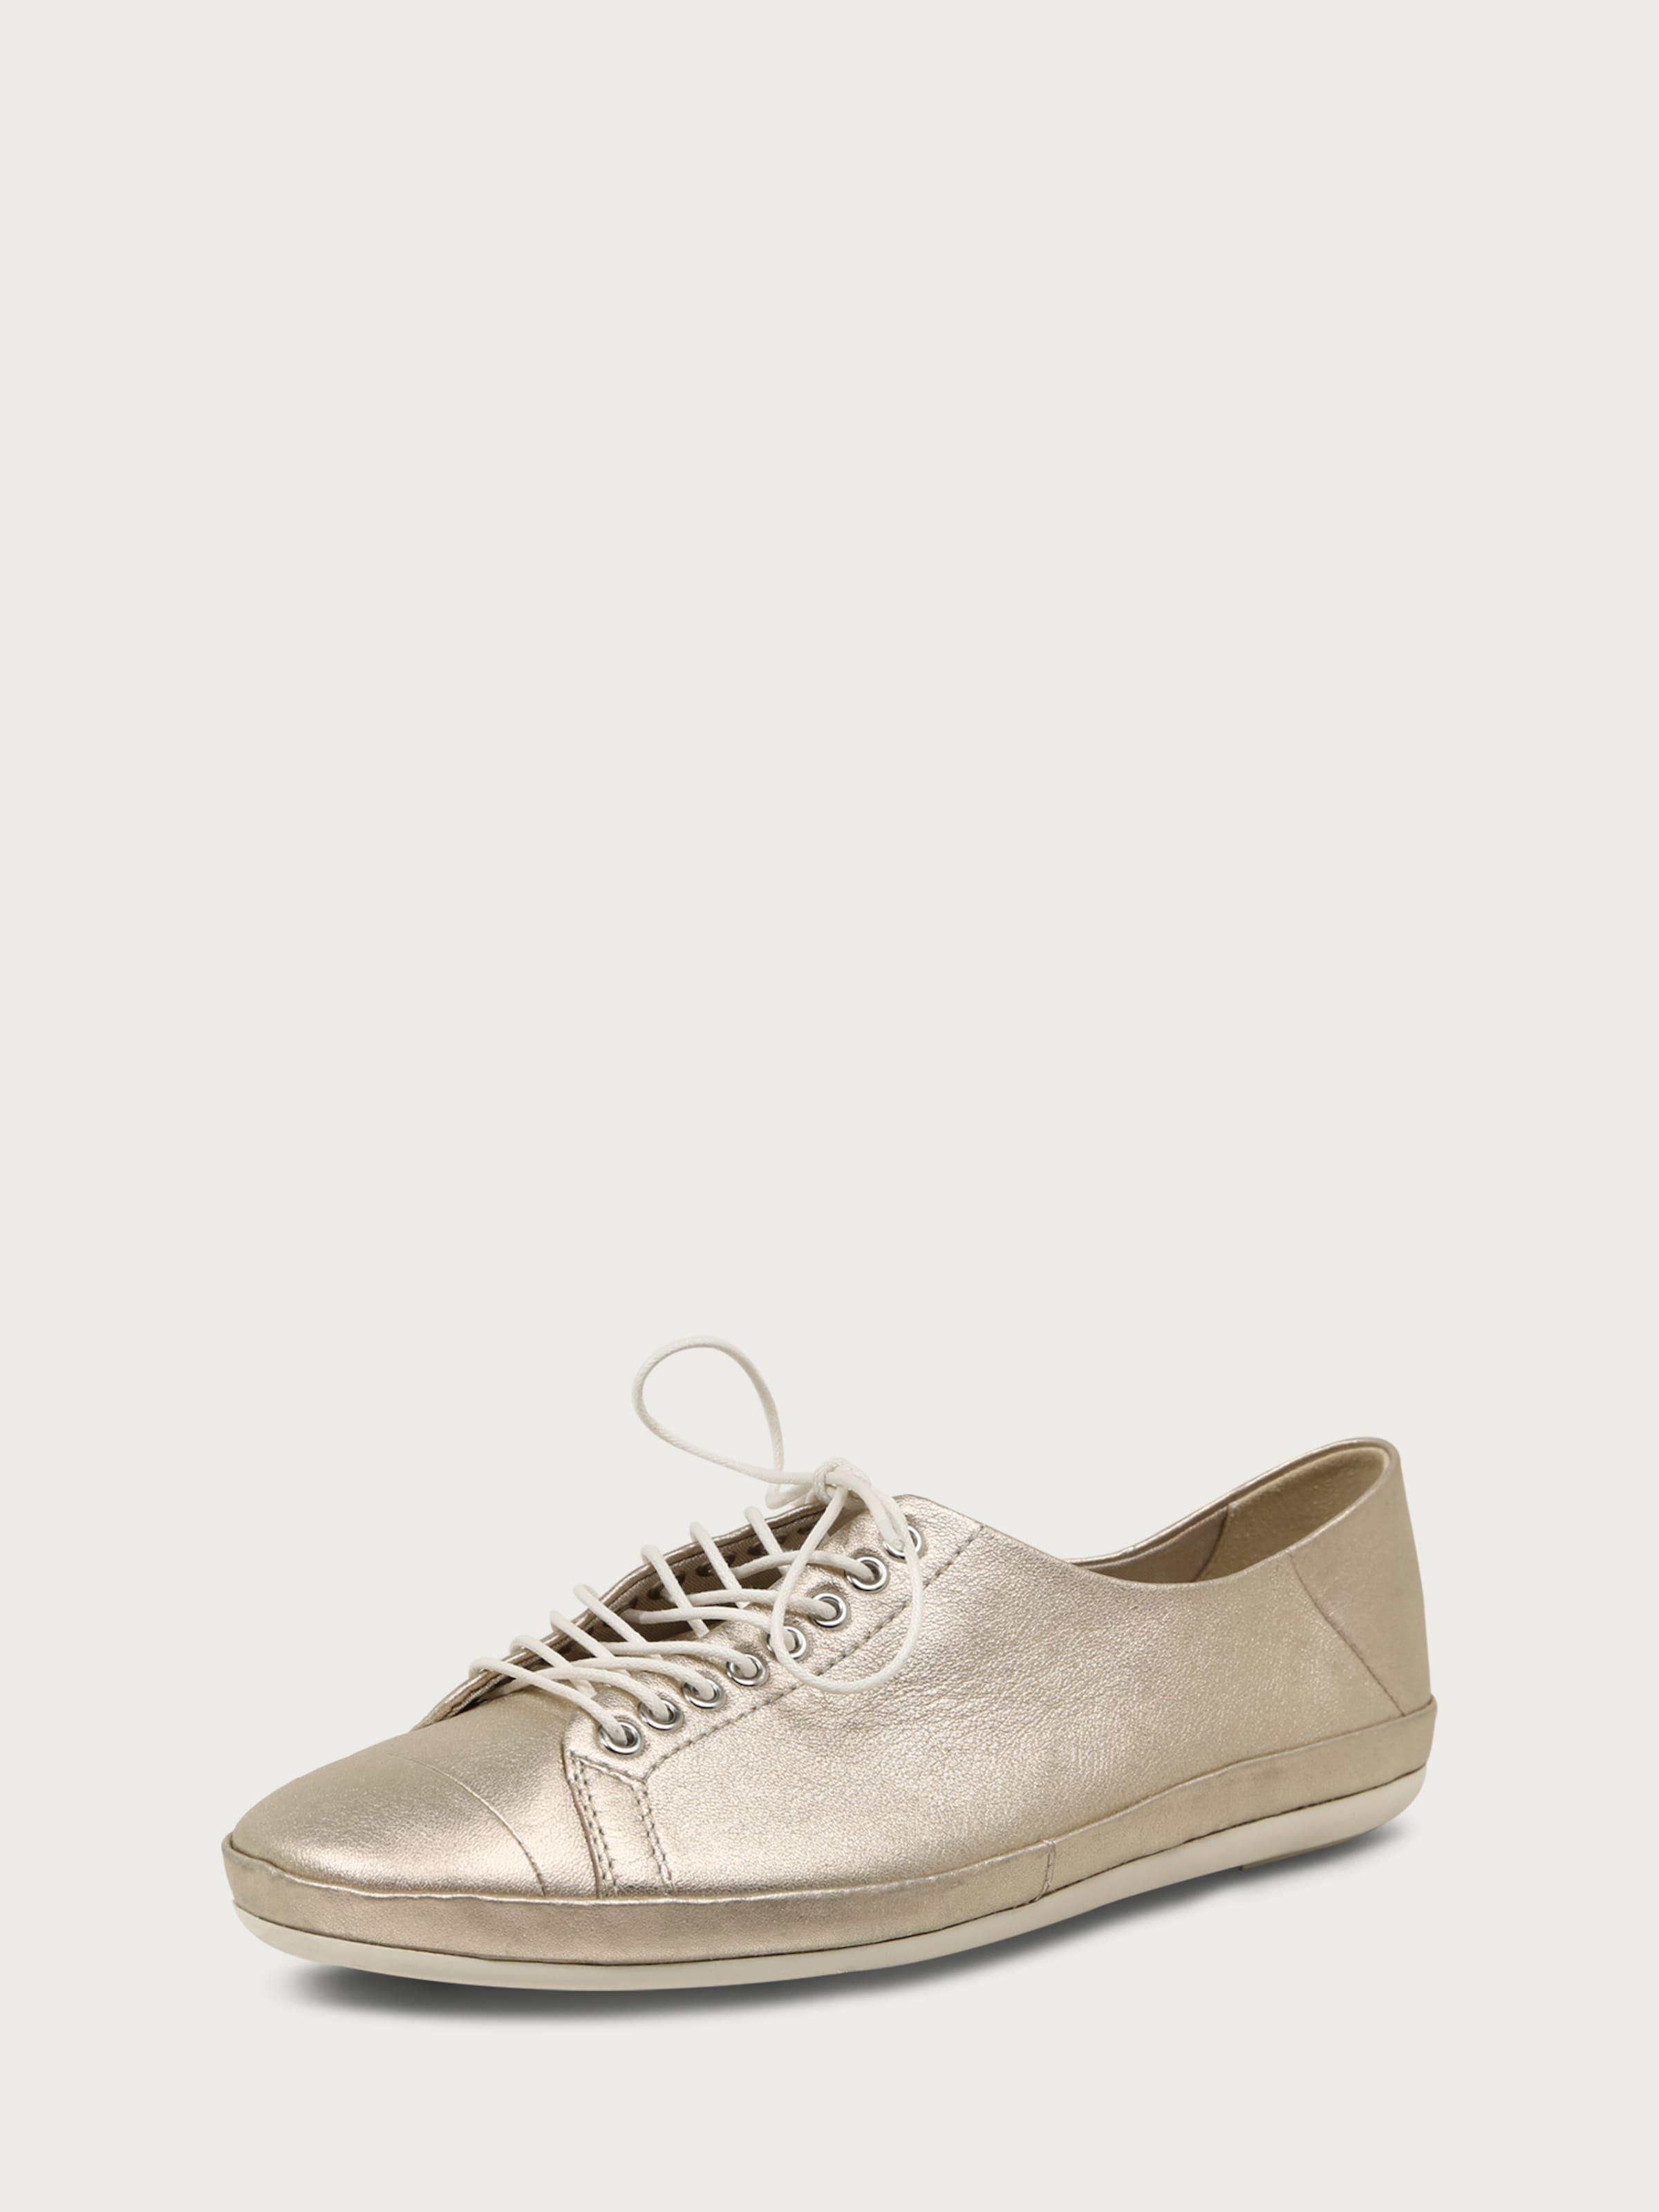 Vagabond Shoemakers Sneaker 'Rose' Gold GyV87tn1m